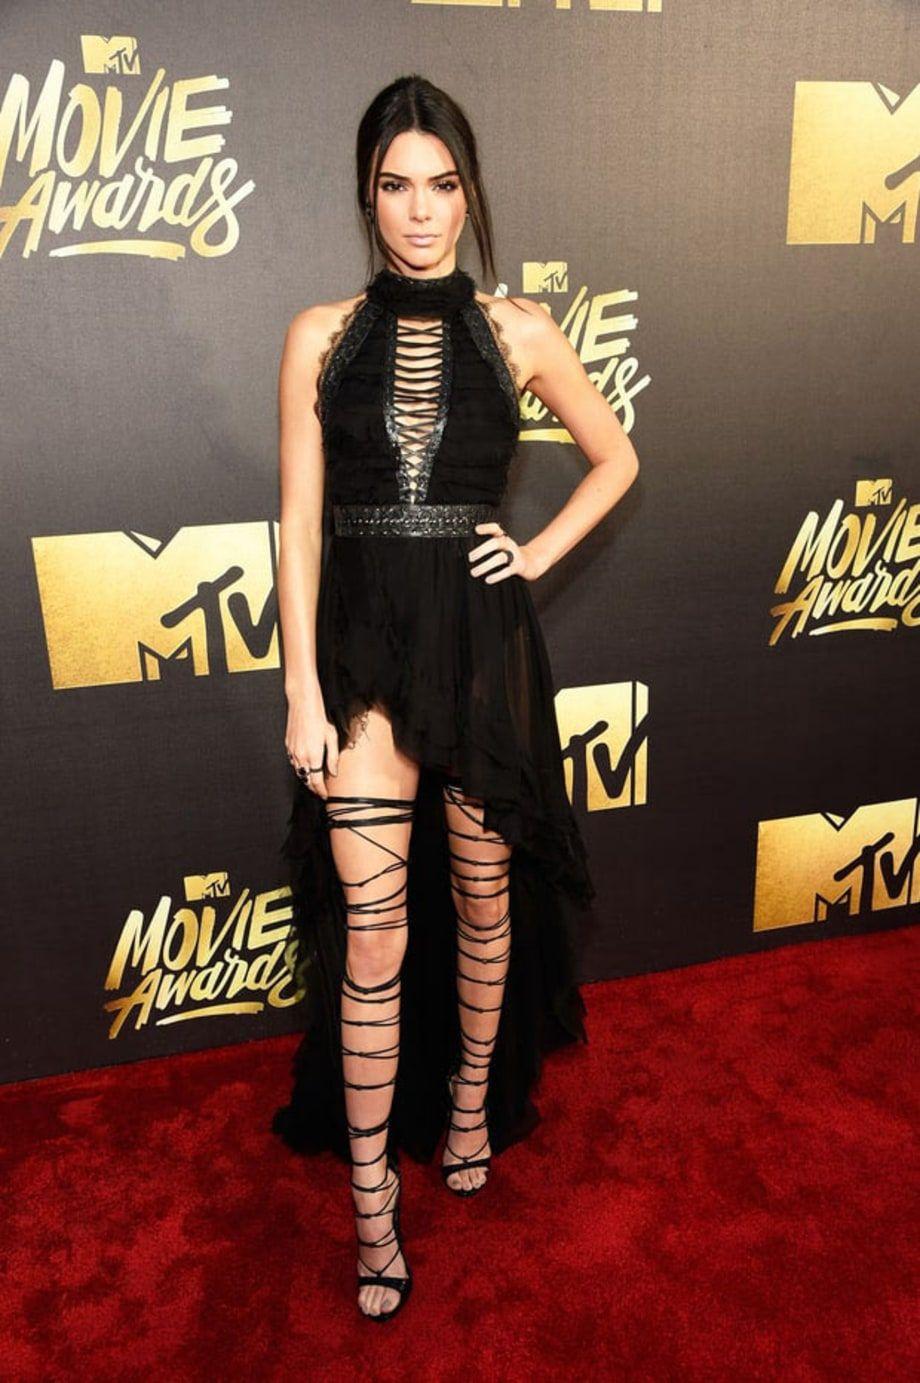 Mtv Movie Awards Red Carpet Arrivals Jenner Red Carpet Nice Dresses Red Carpet Fashion [ 1383 x 920 Pixel ]